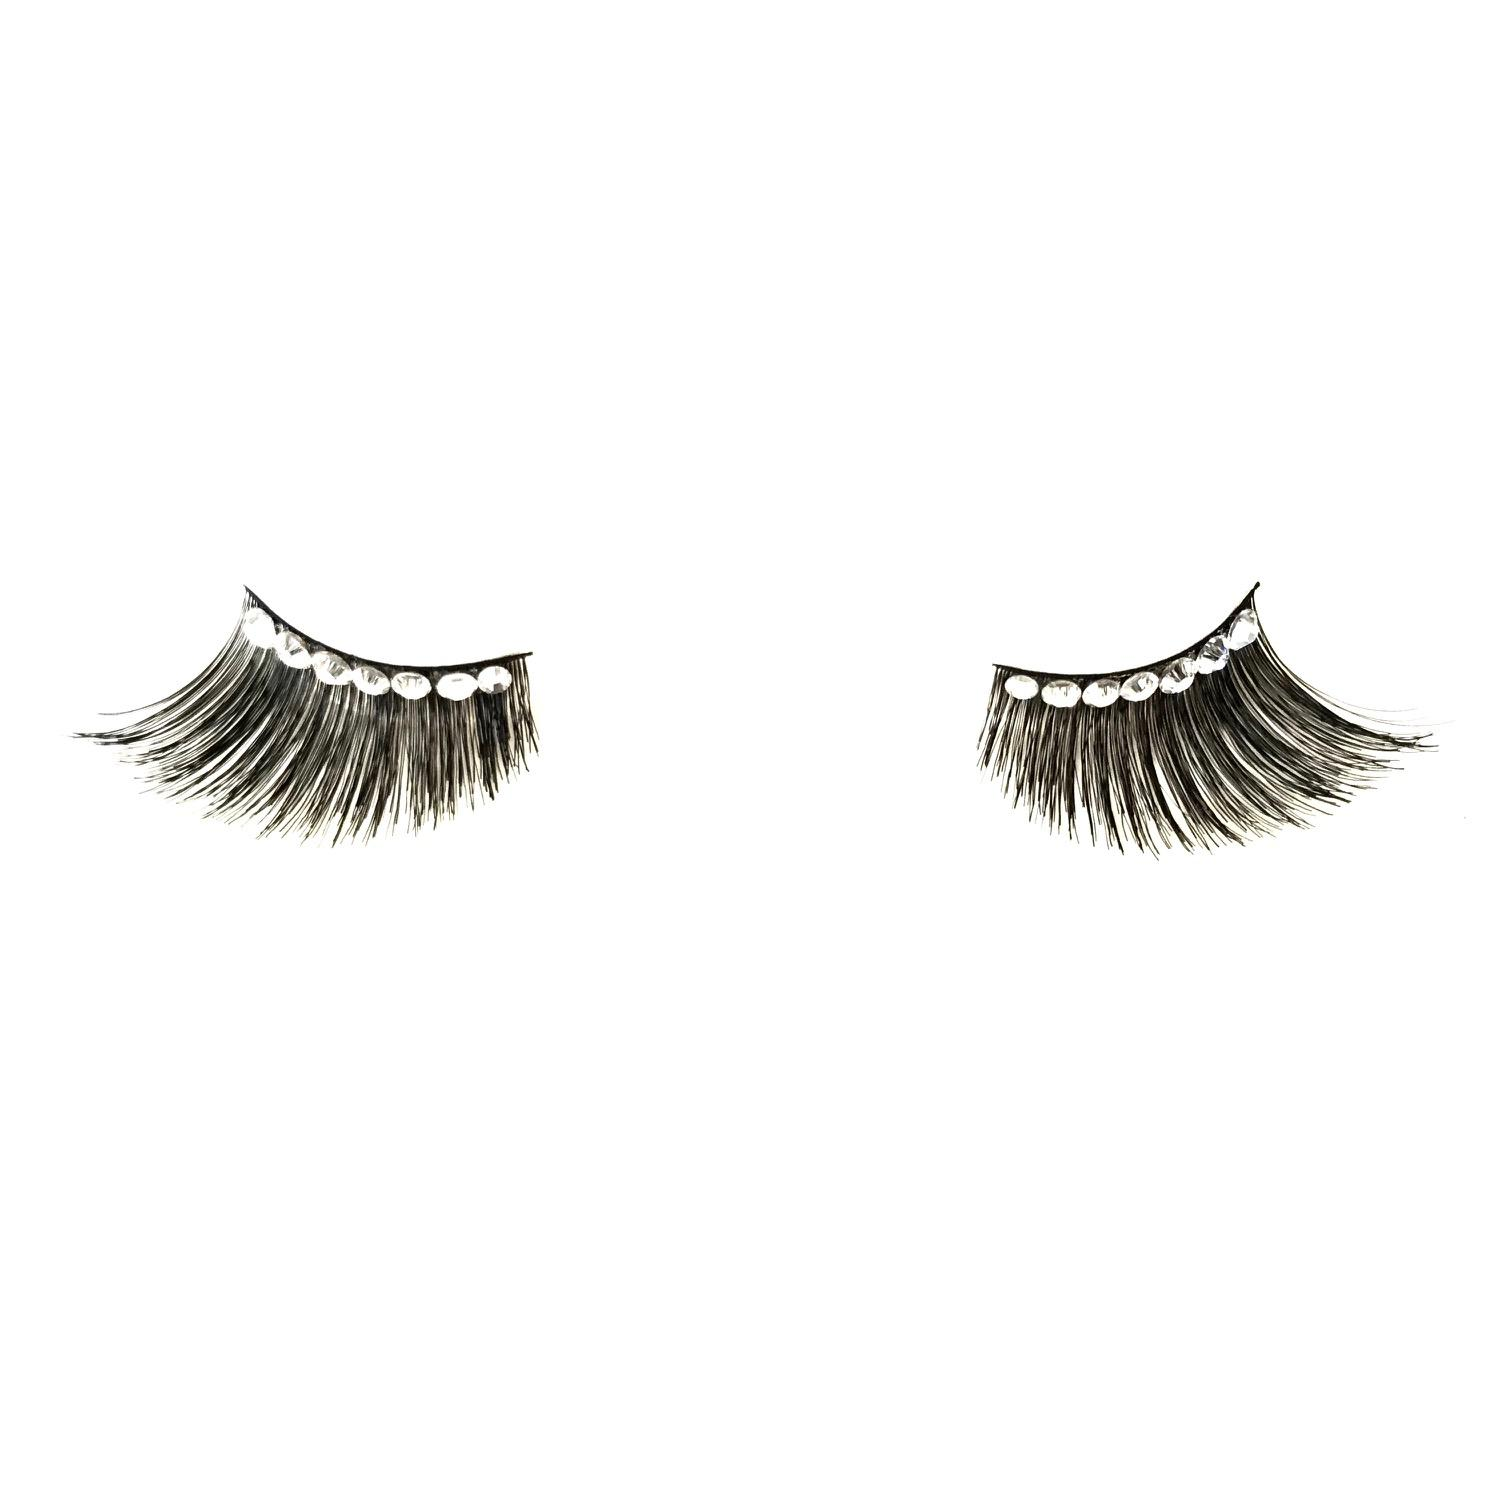 Maquillage kryolan faux cils avec strass 9381